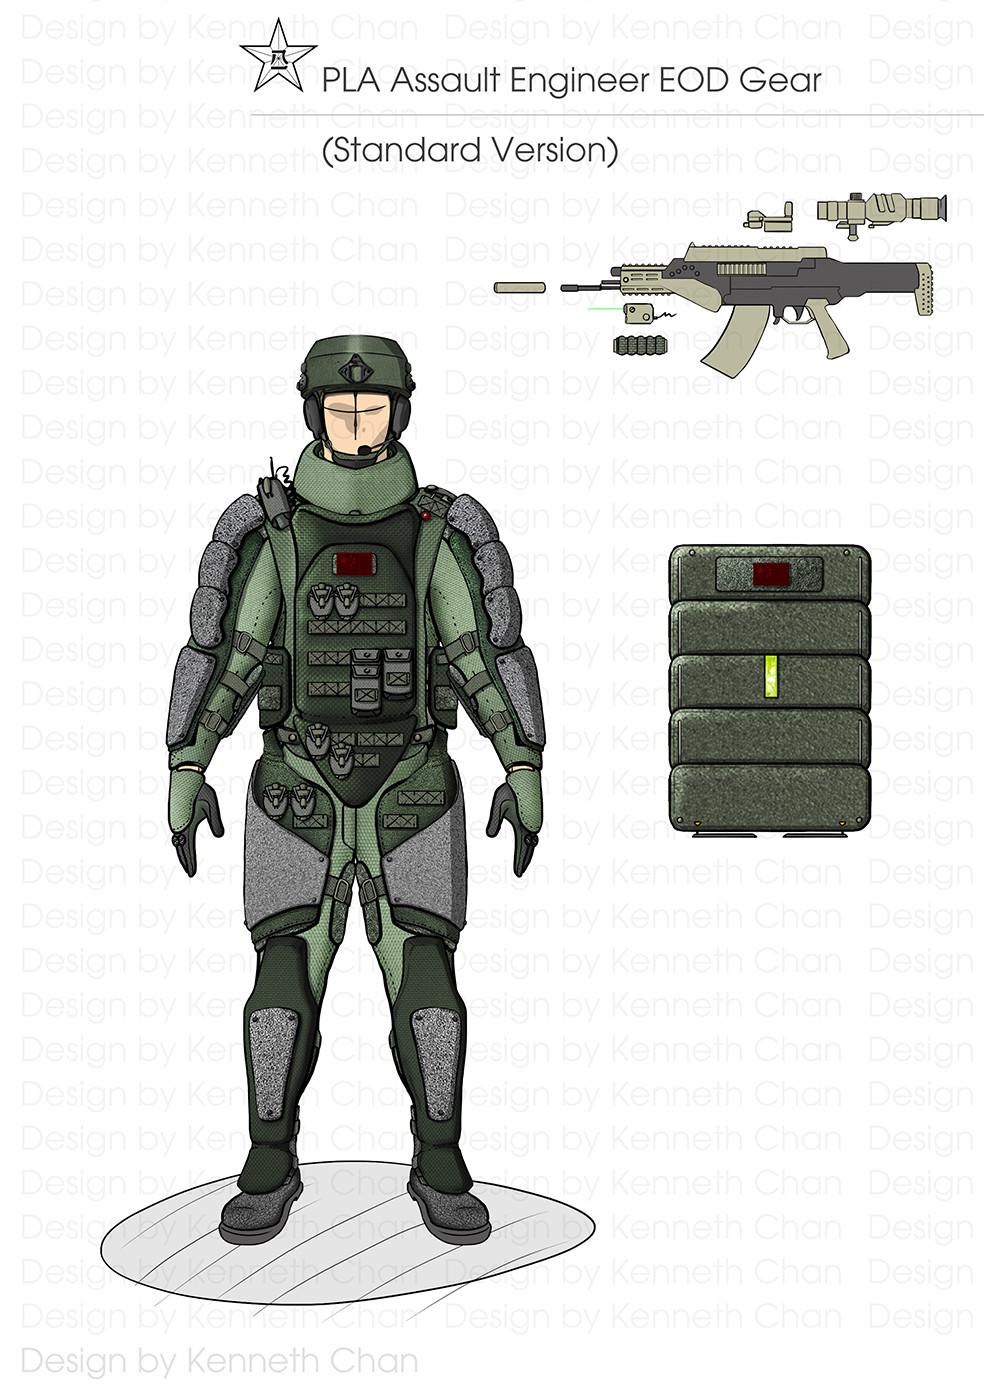 PLA Assault Engineers EOD Gear  Standard Version Gear (Lightweight Storage Bulletproof Shield & QBZ11 OICW)